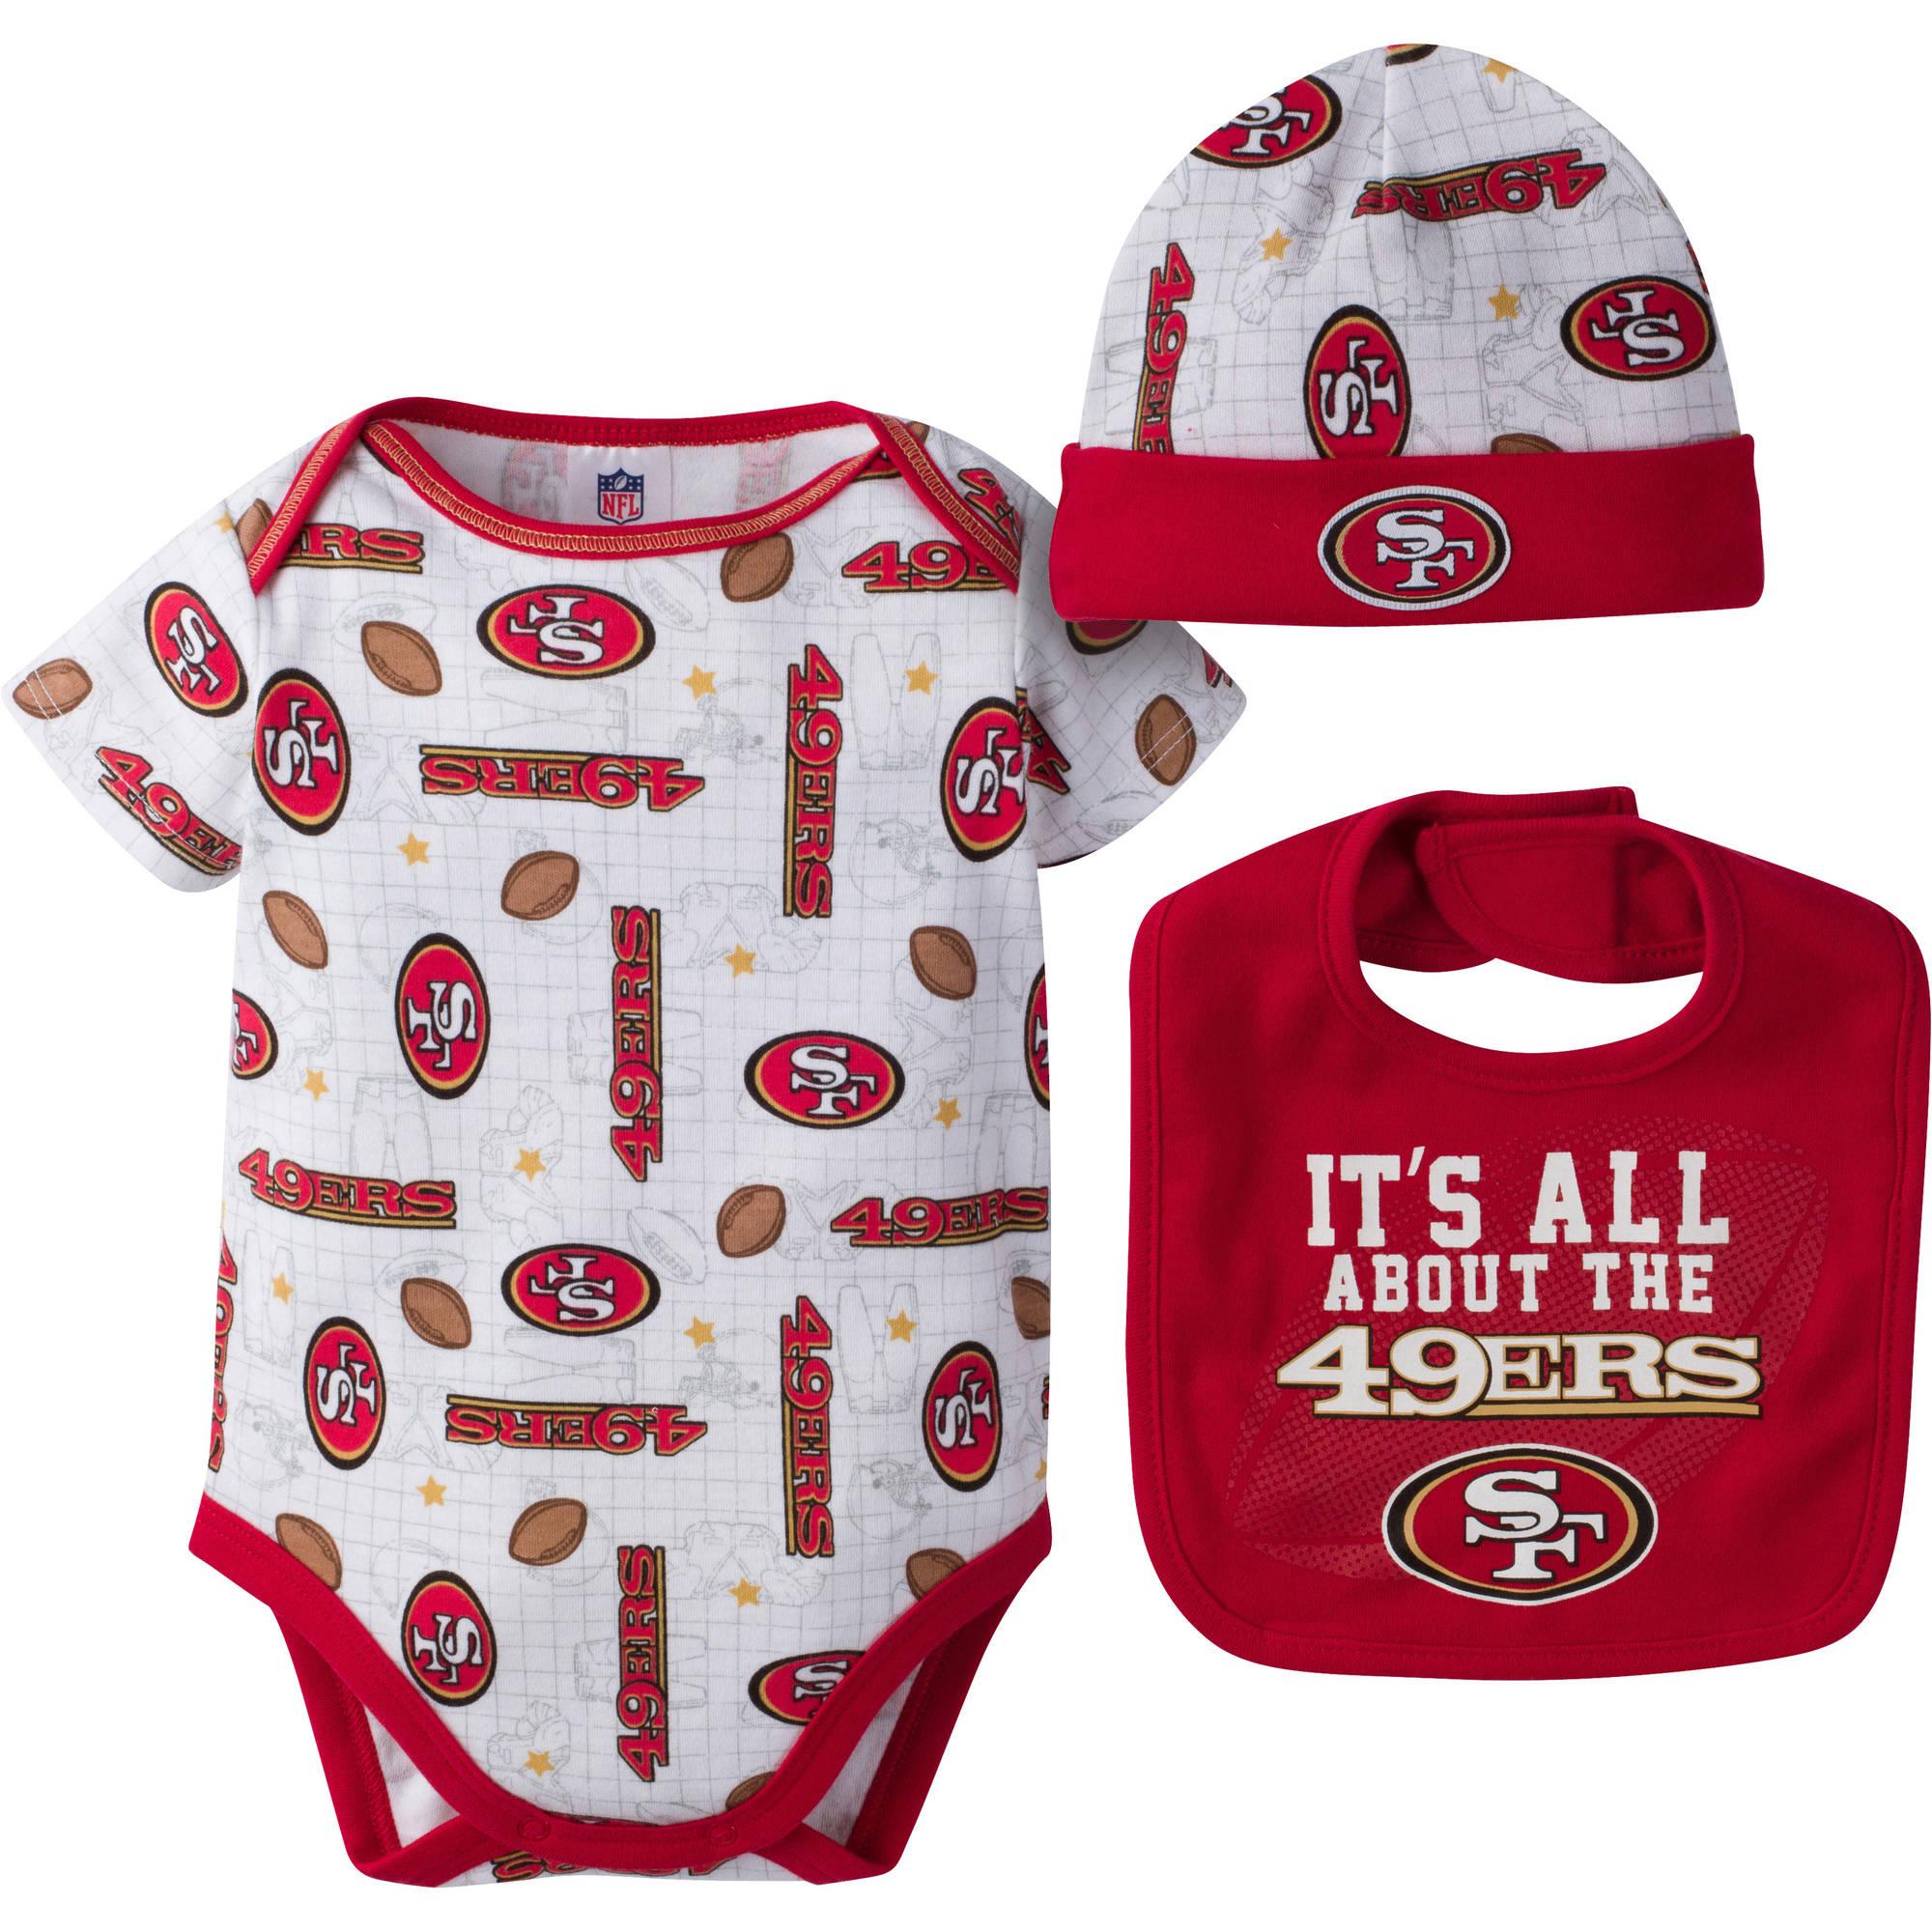 NFL San Francisco 49ers Baby Boys Bodysuit, Bib and Cap Outfit Set, 3-Piece